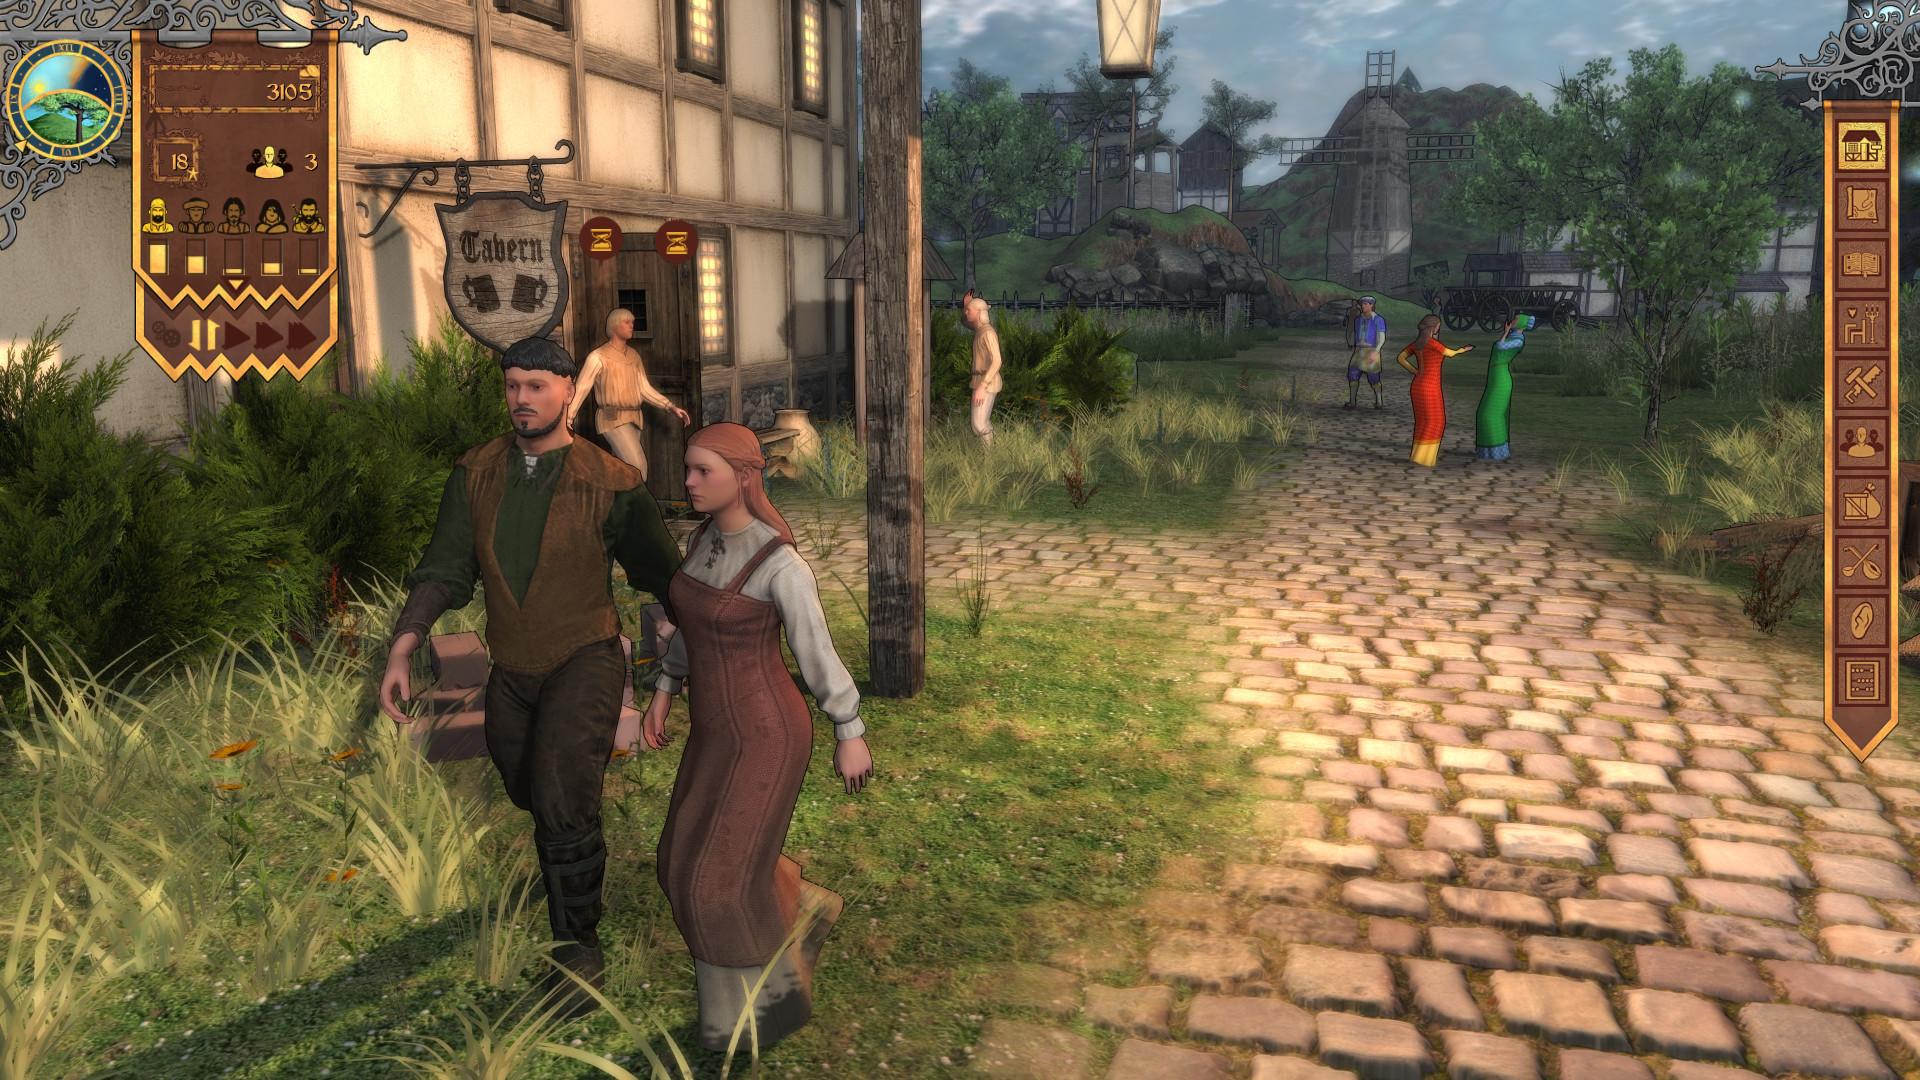 crossroads-inn-anniversary-edition-pc-screenshot-02